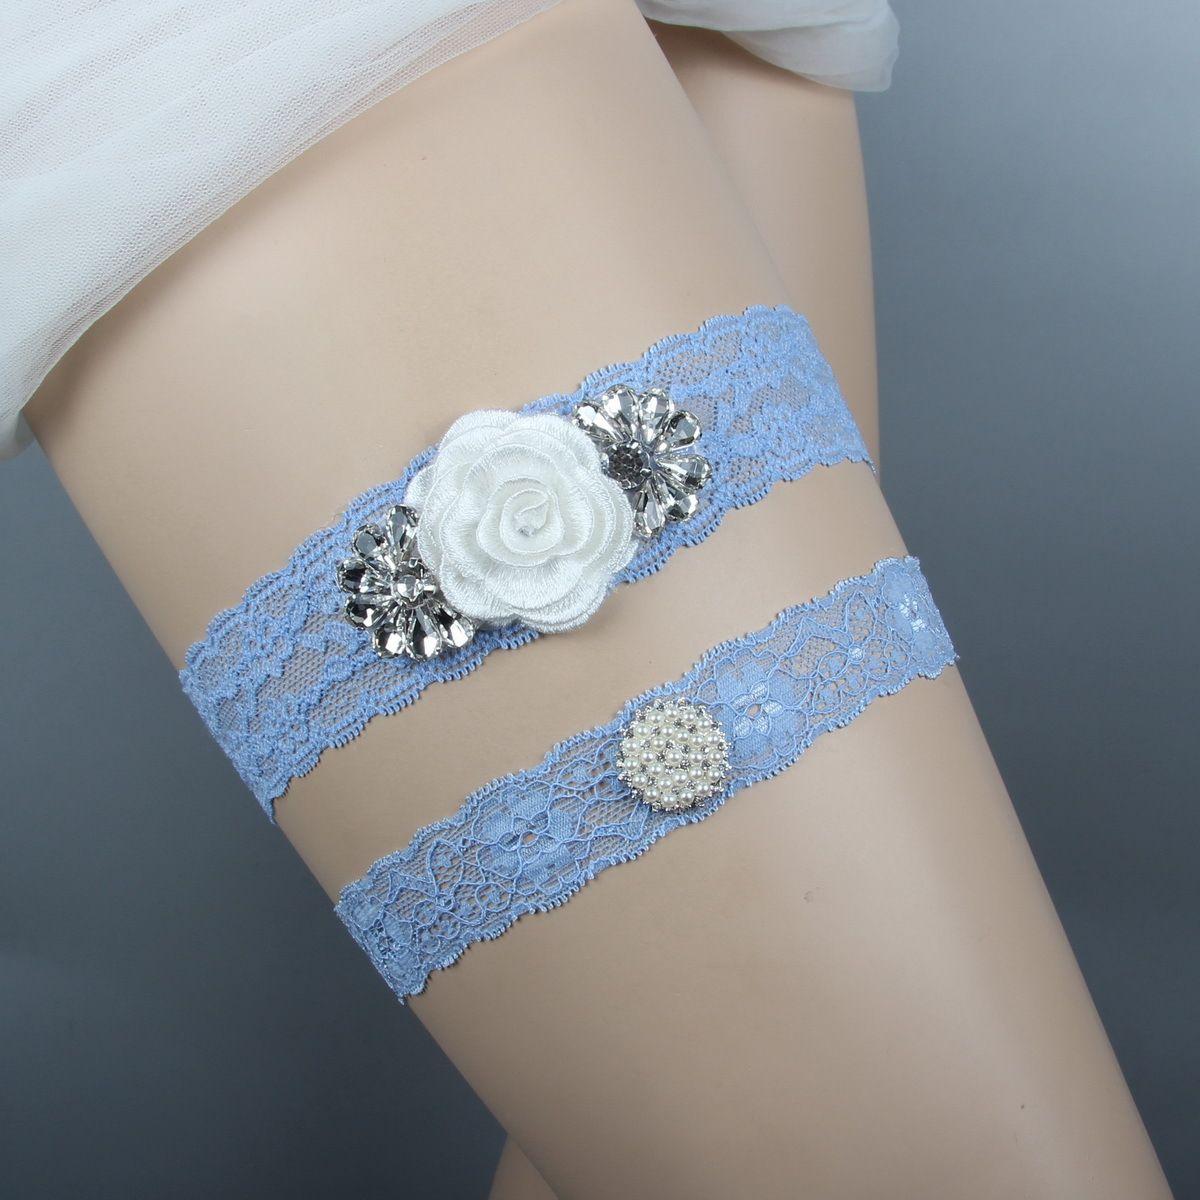 71055175977 Wedding Garters For Bride Blue Bridal Leg Garters Belt Set Lace Rhinestones  Crystals Plus Size Flowers Handmade Blue Lace YY021 Wedding Garters Sets  Where ...